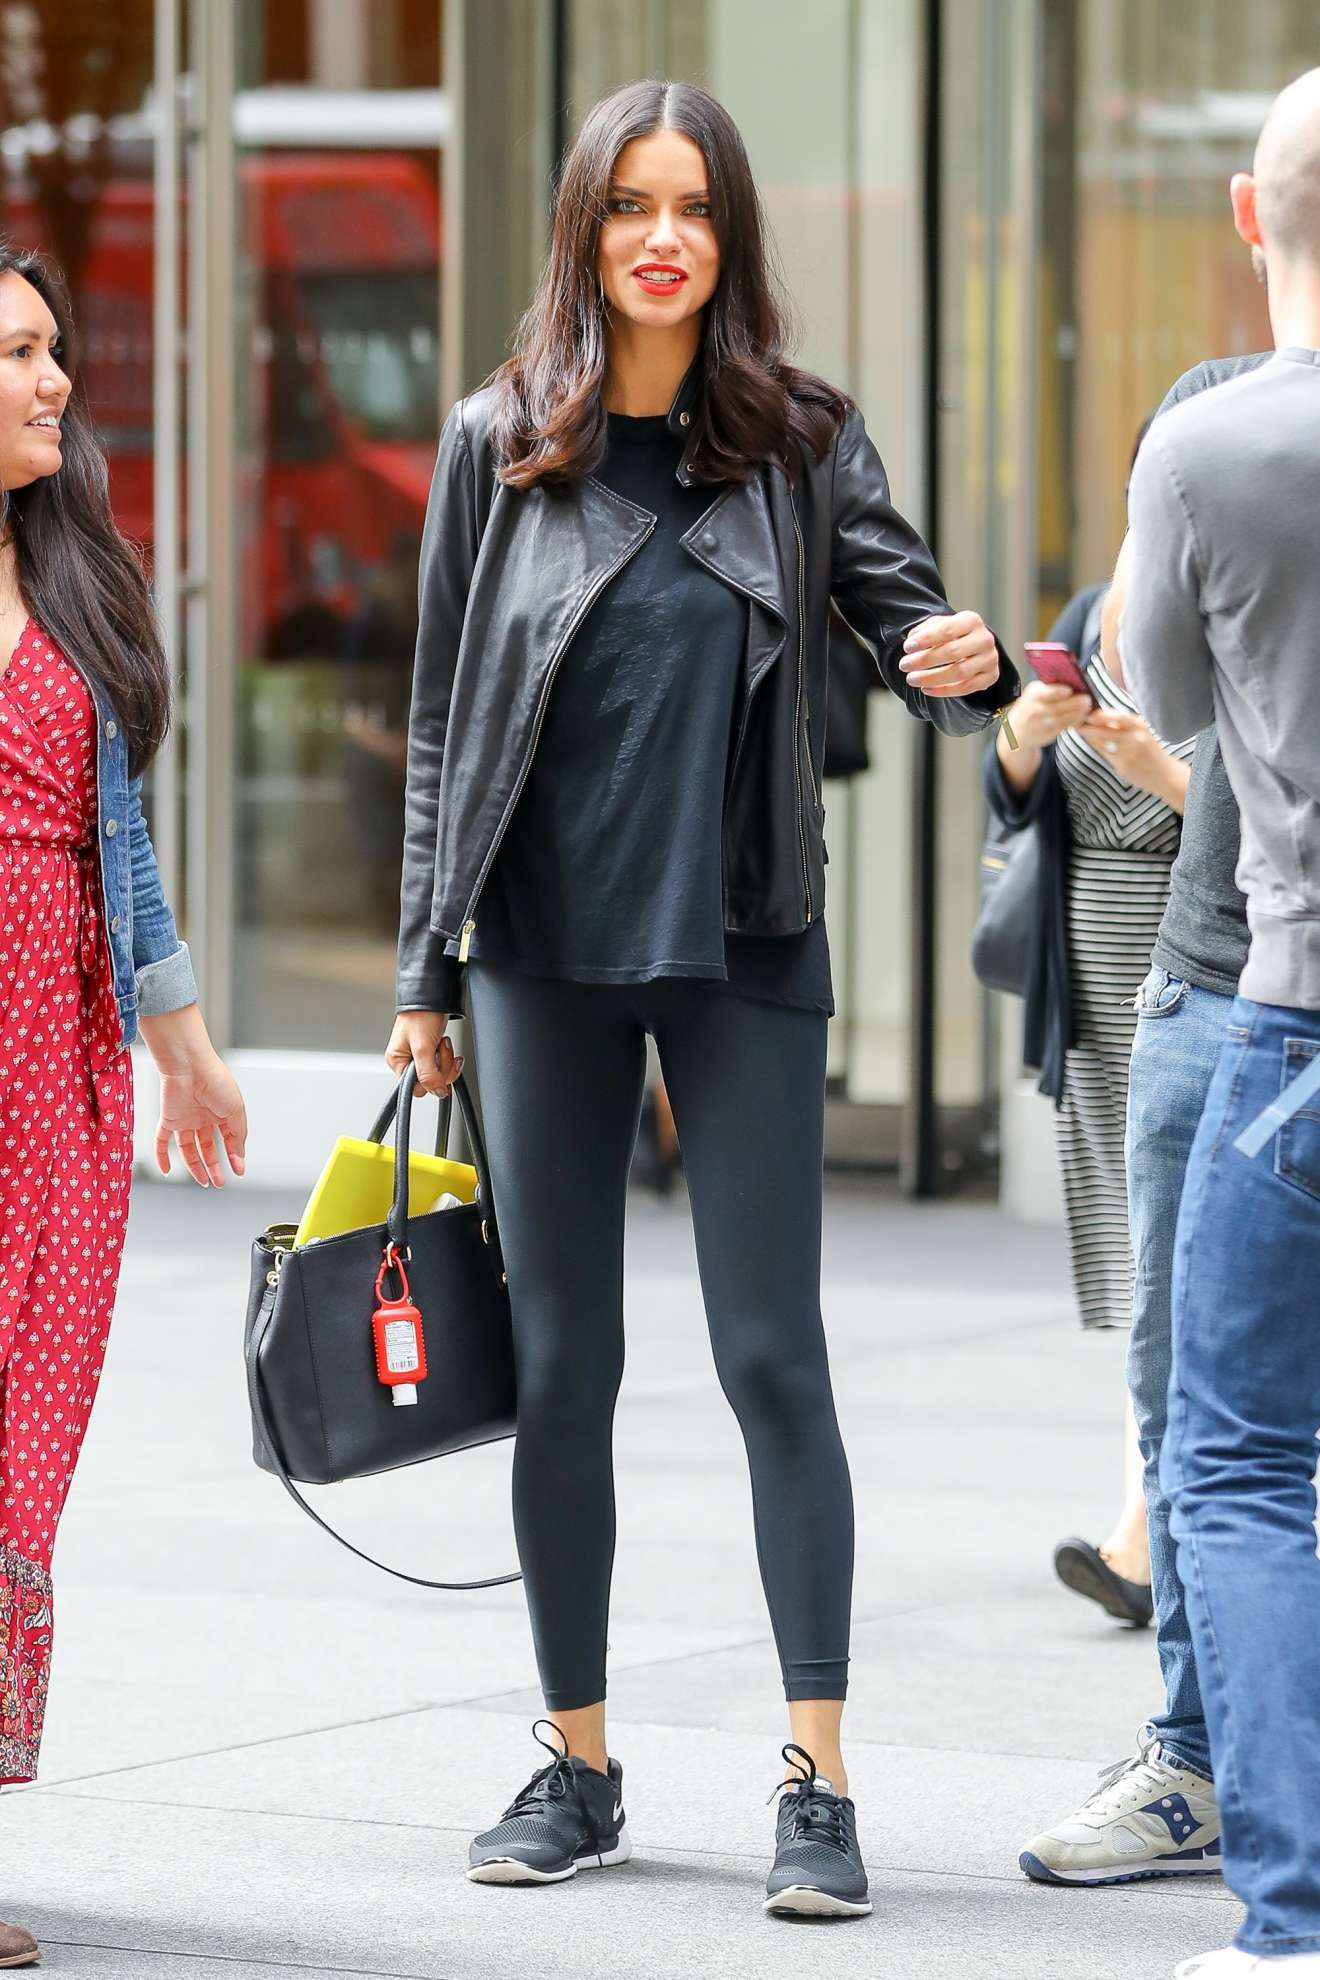 Nfl On Sirius >> Adriana Lima - Leaving SiriusXM studios in New York City